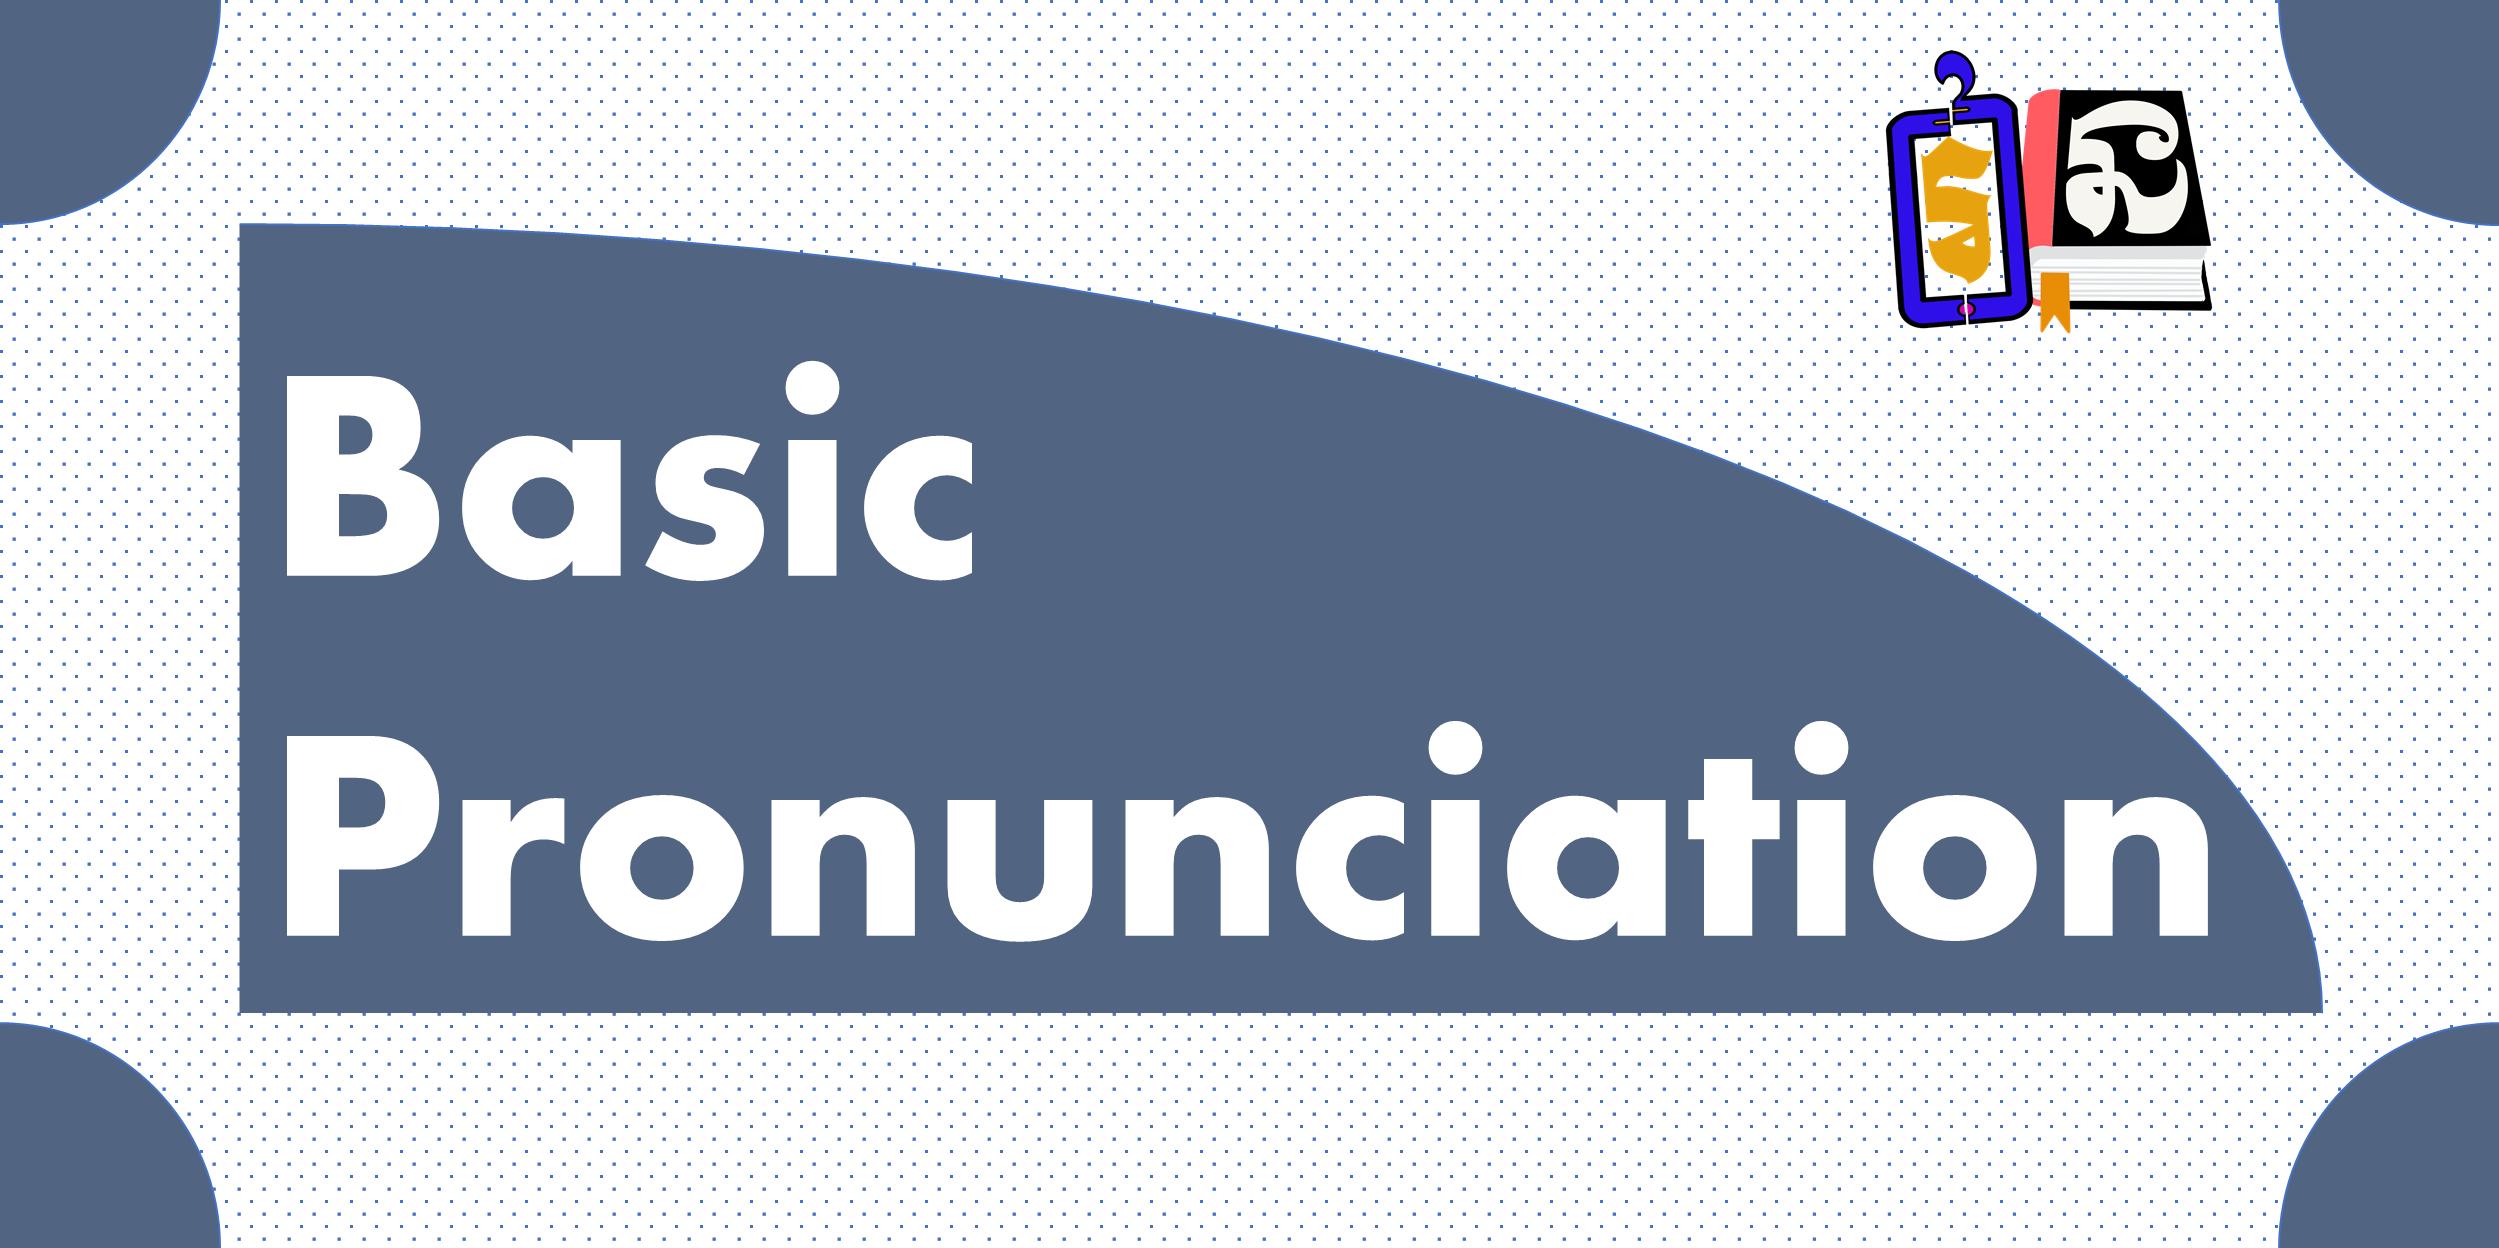 Basic Pronunciation